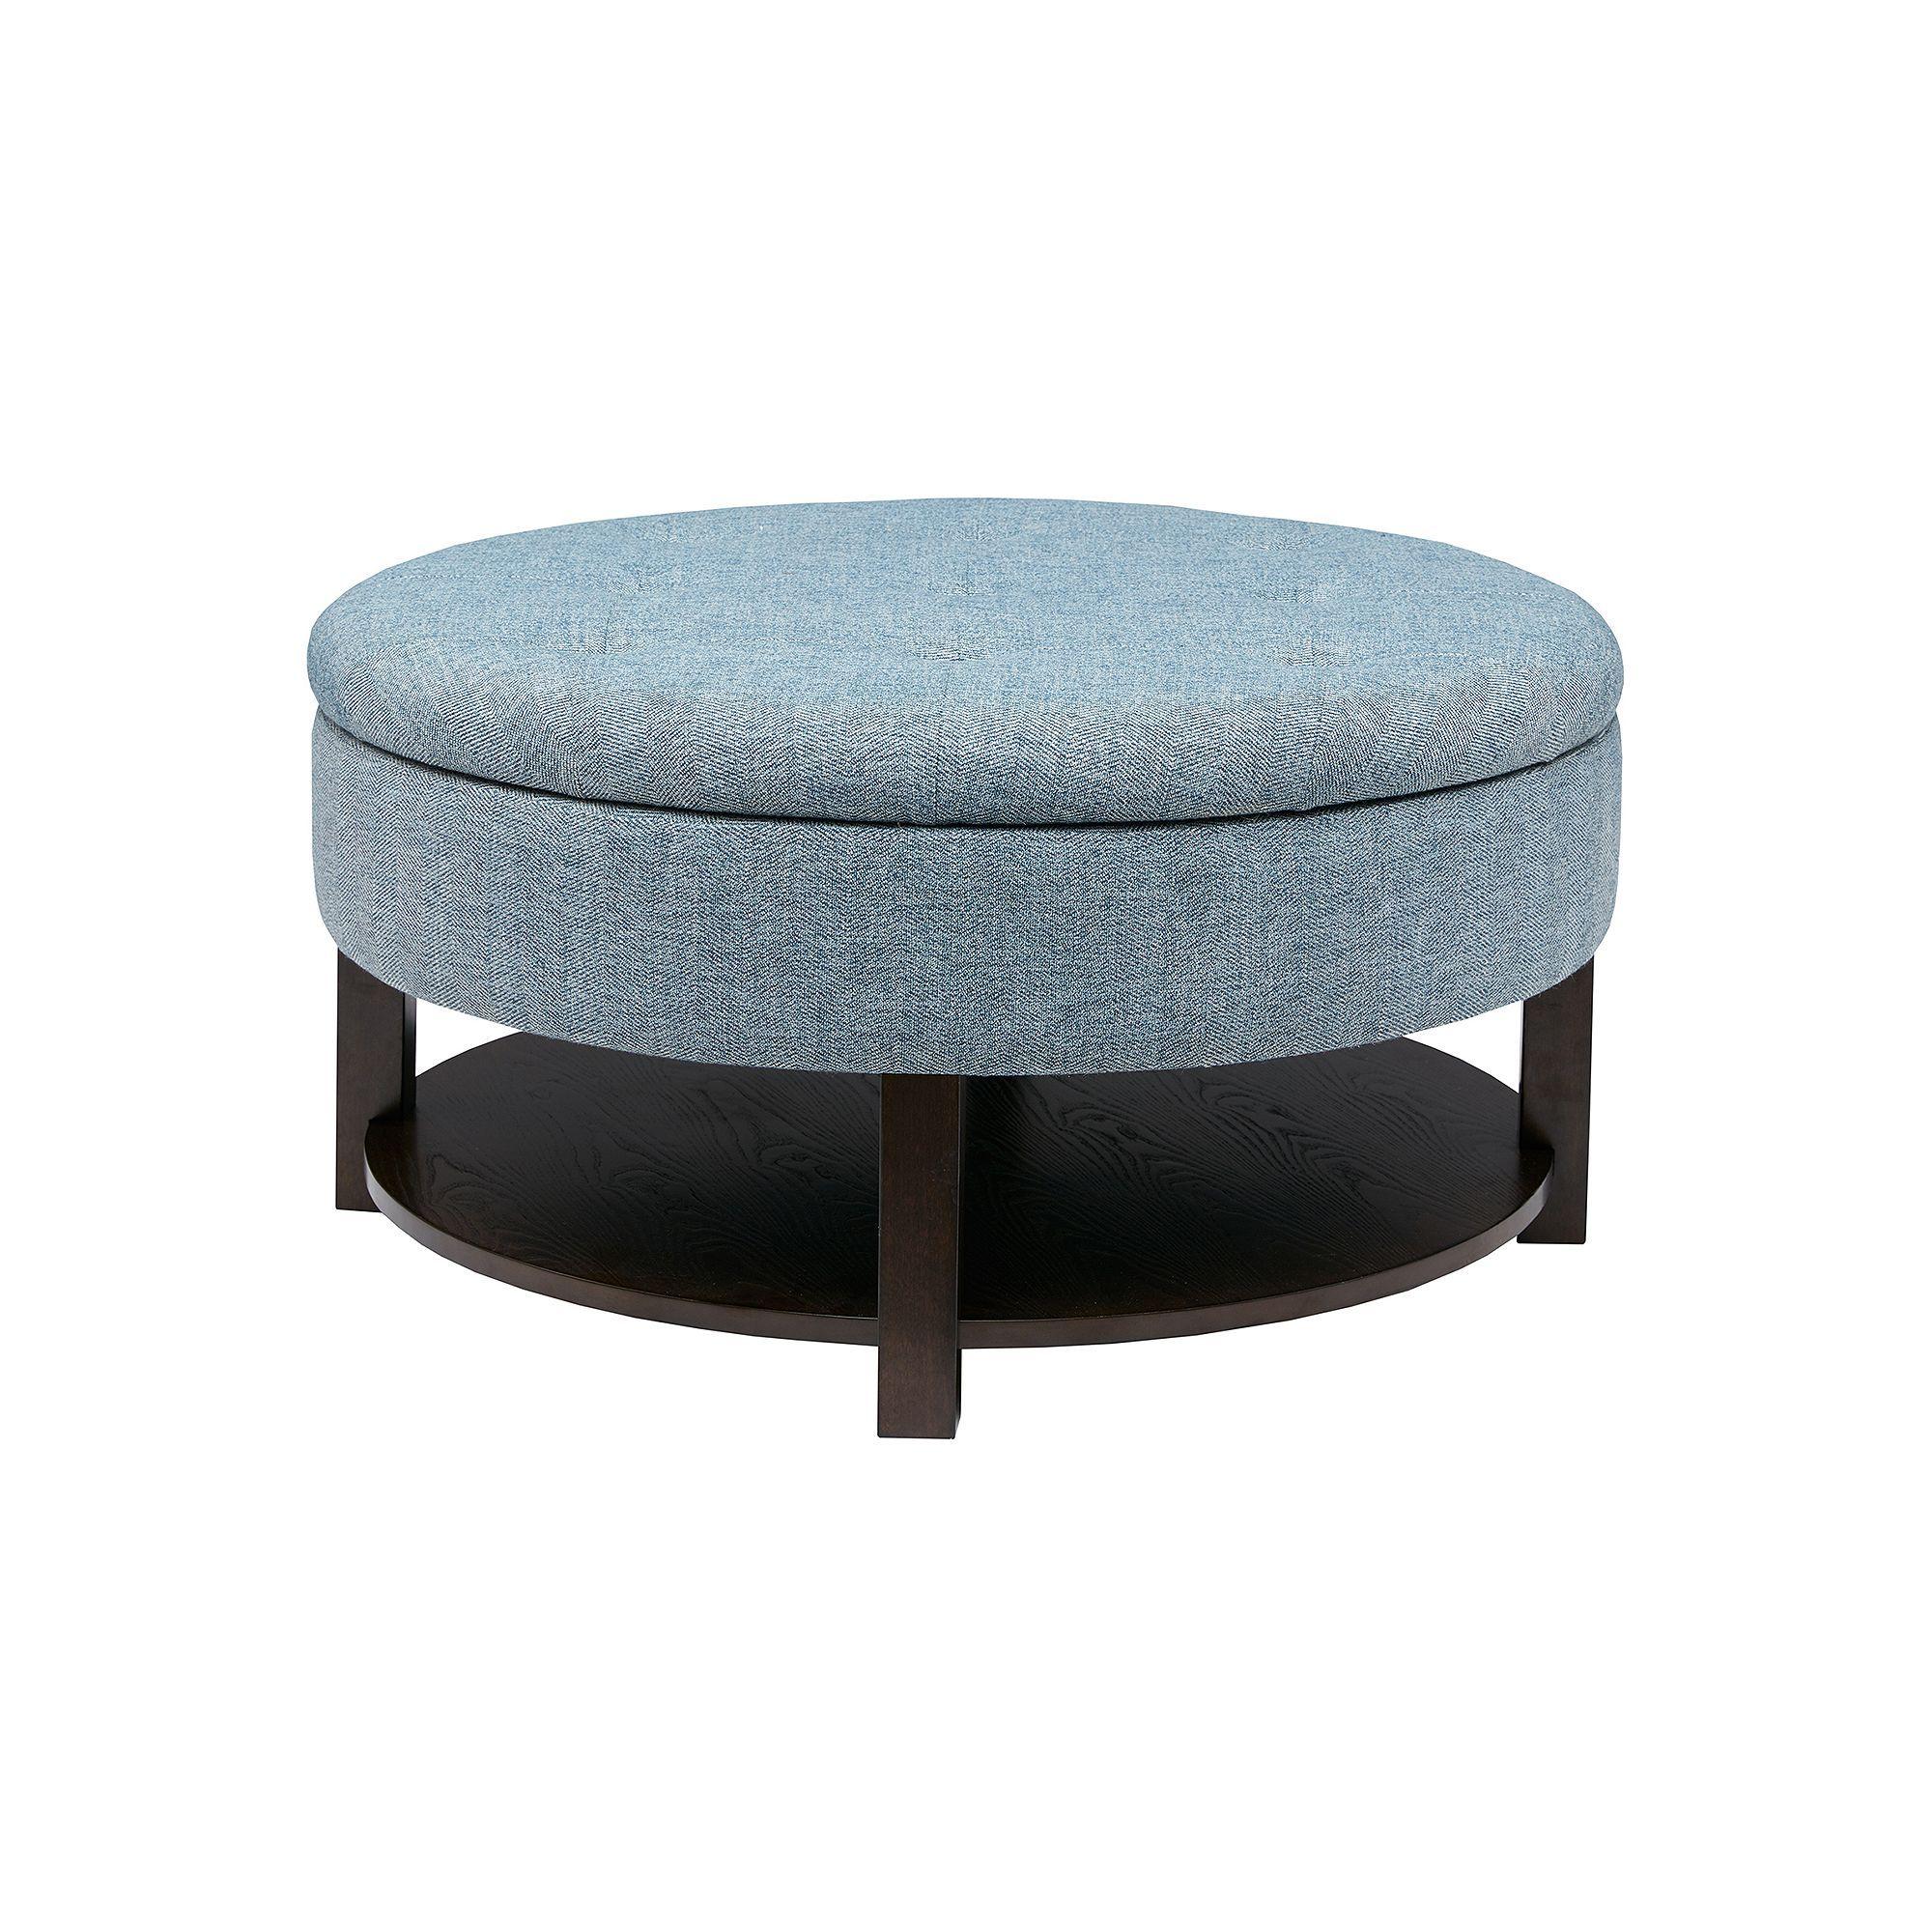 Stupendous Madison Park Round Storage Ottoman Products In 2019 Machost Co Dining Chair Design Ideas Machostcouk